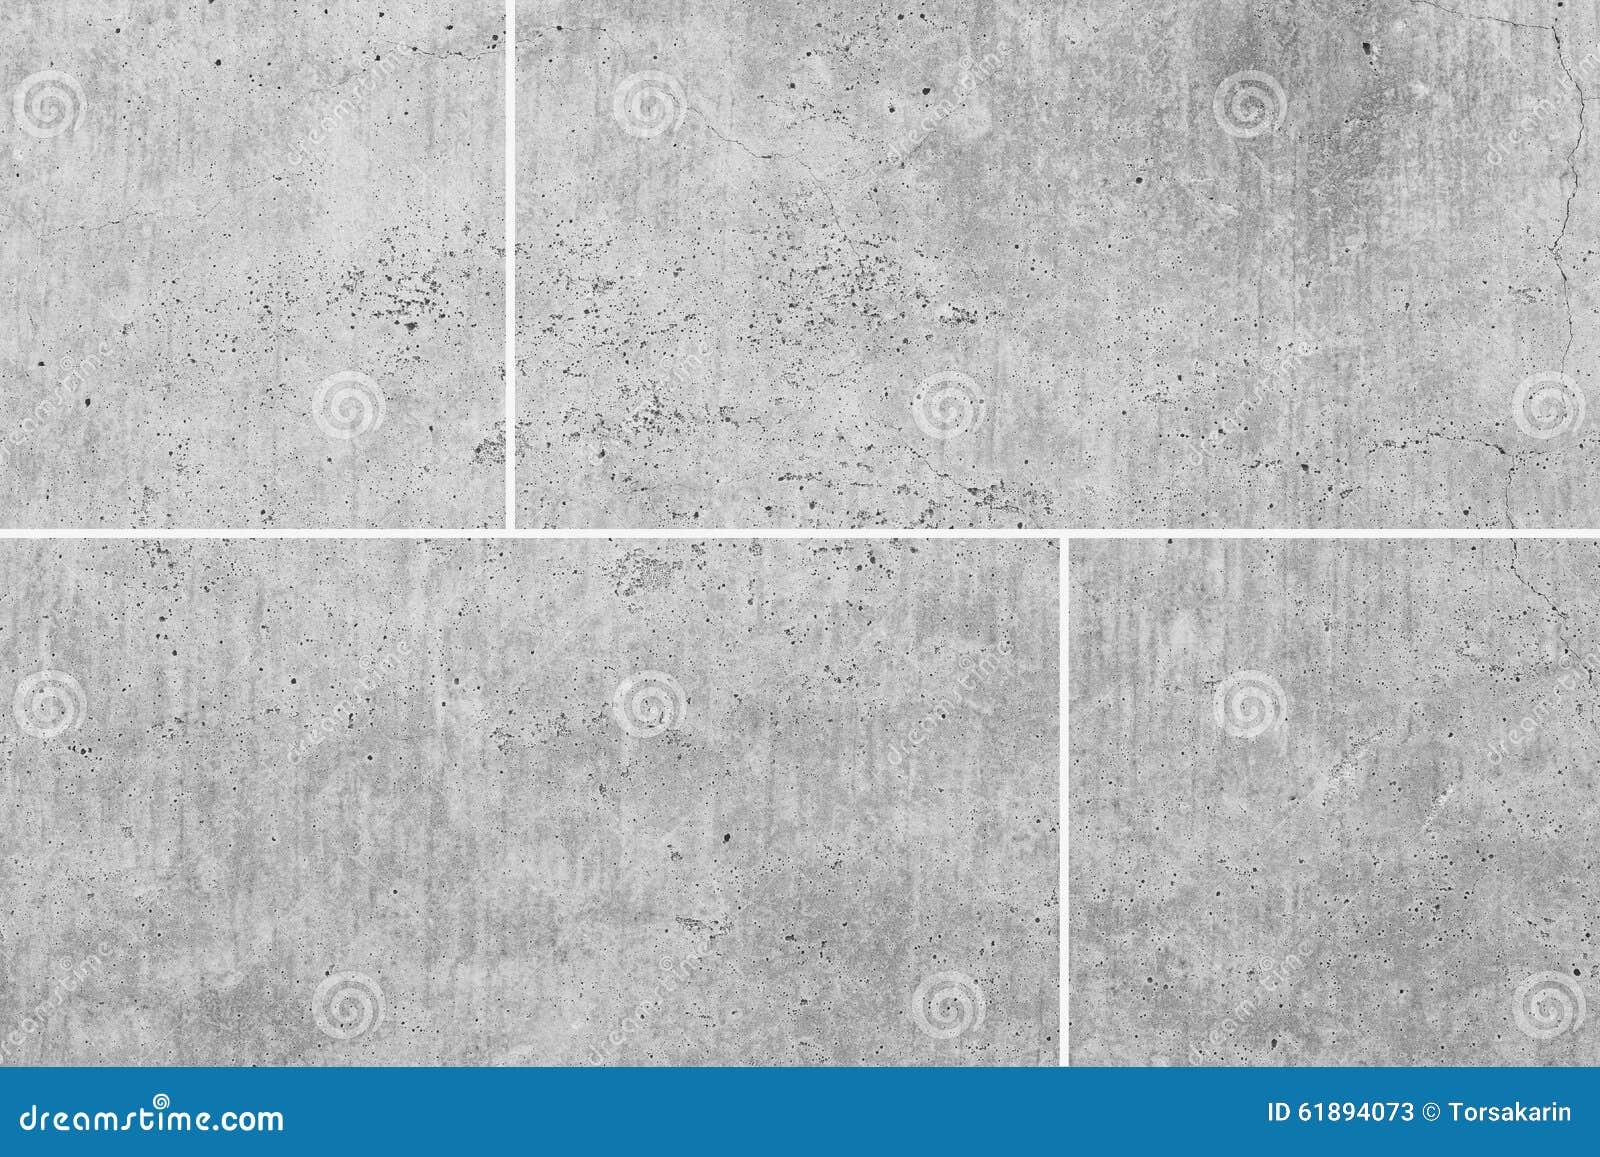 White stone floor texture stock image Image of road 61894073